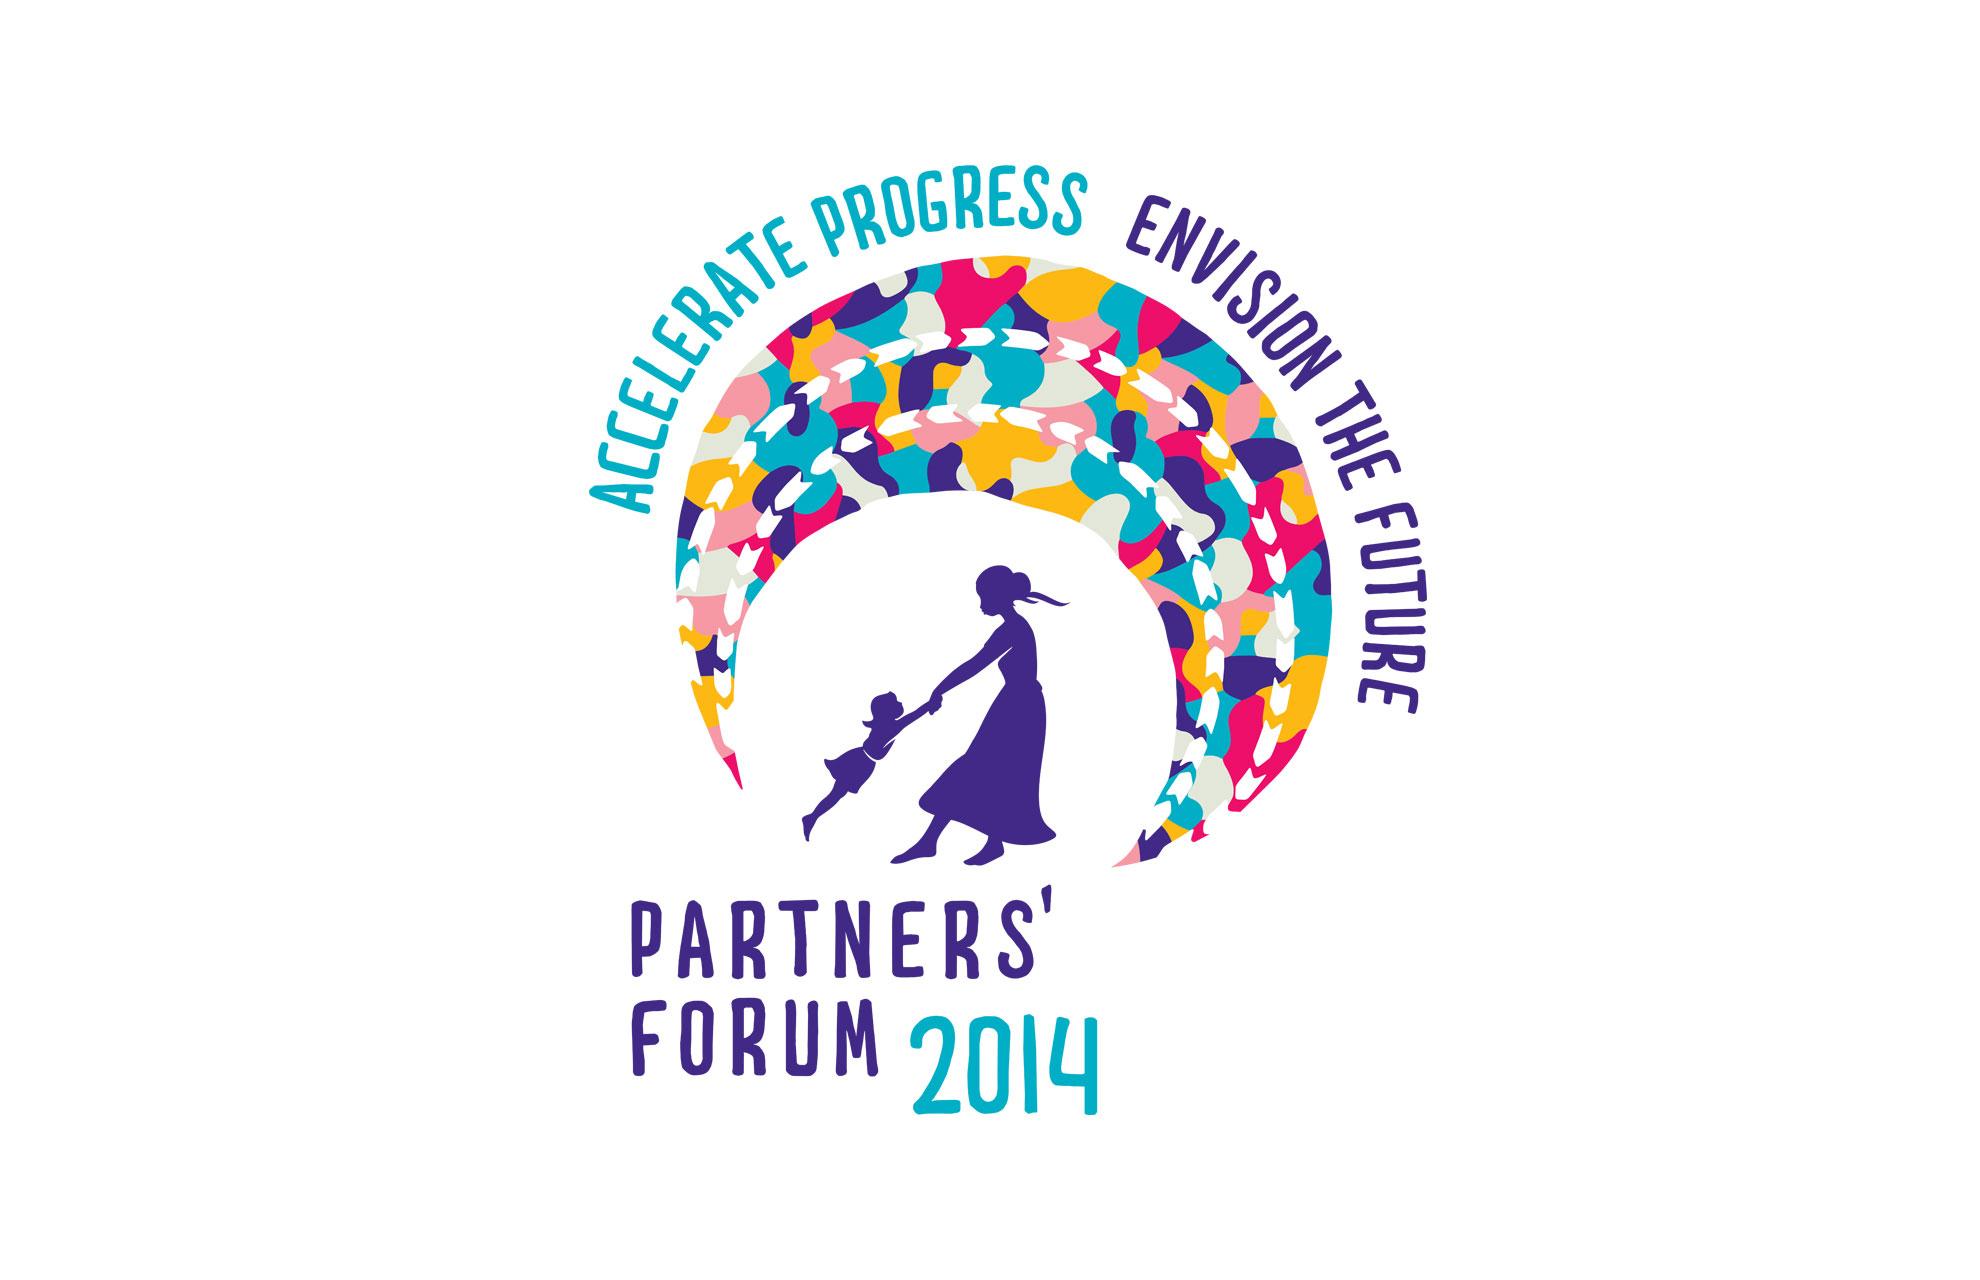 Rhythms for South Africa: Partners Forum 2014